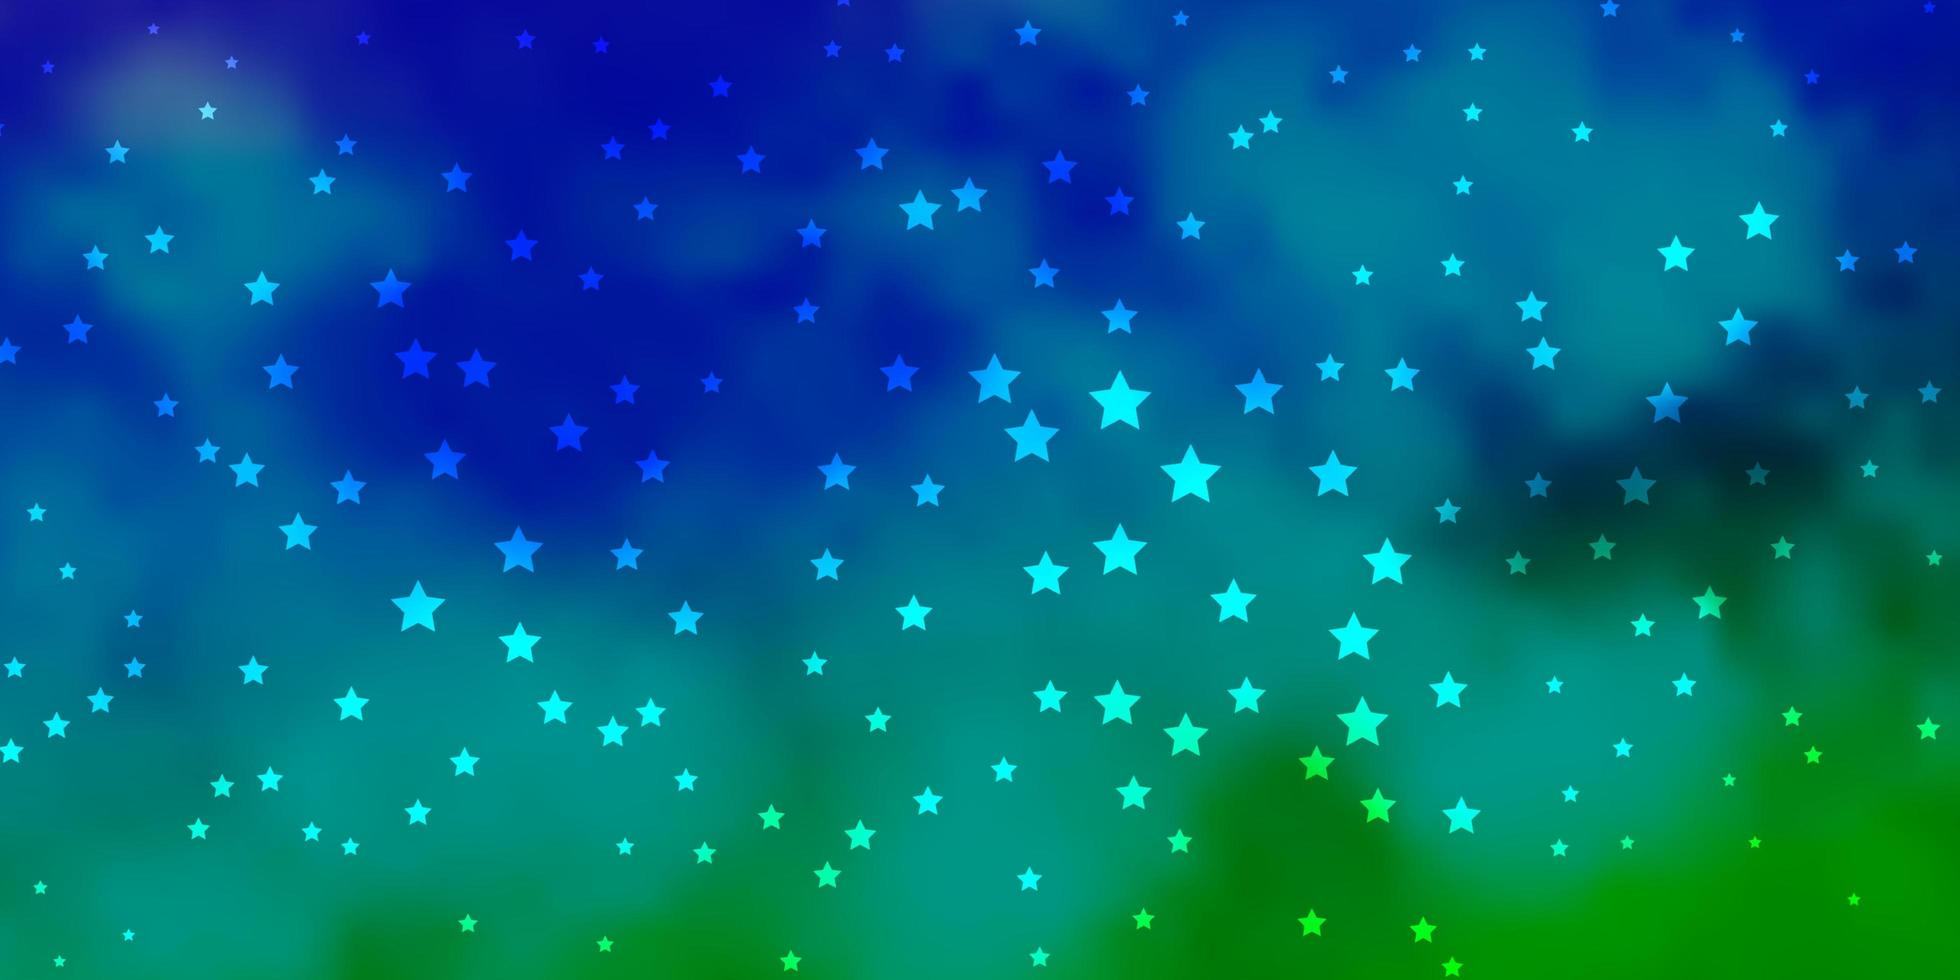 dunkles mehrfarbiges Vektormuster mit abstrakten Sternen. vektor